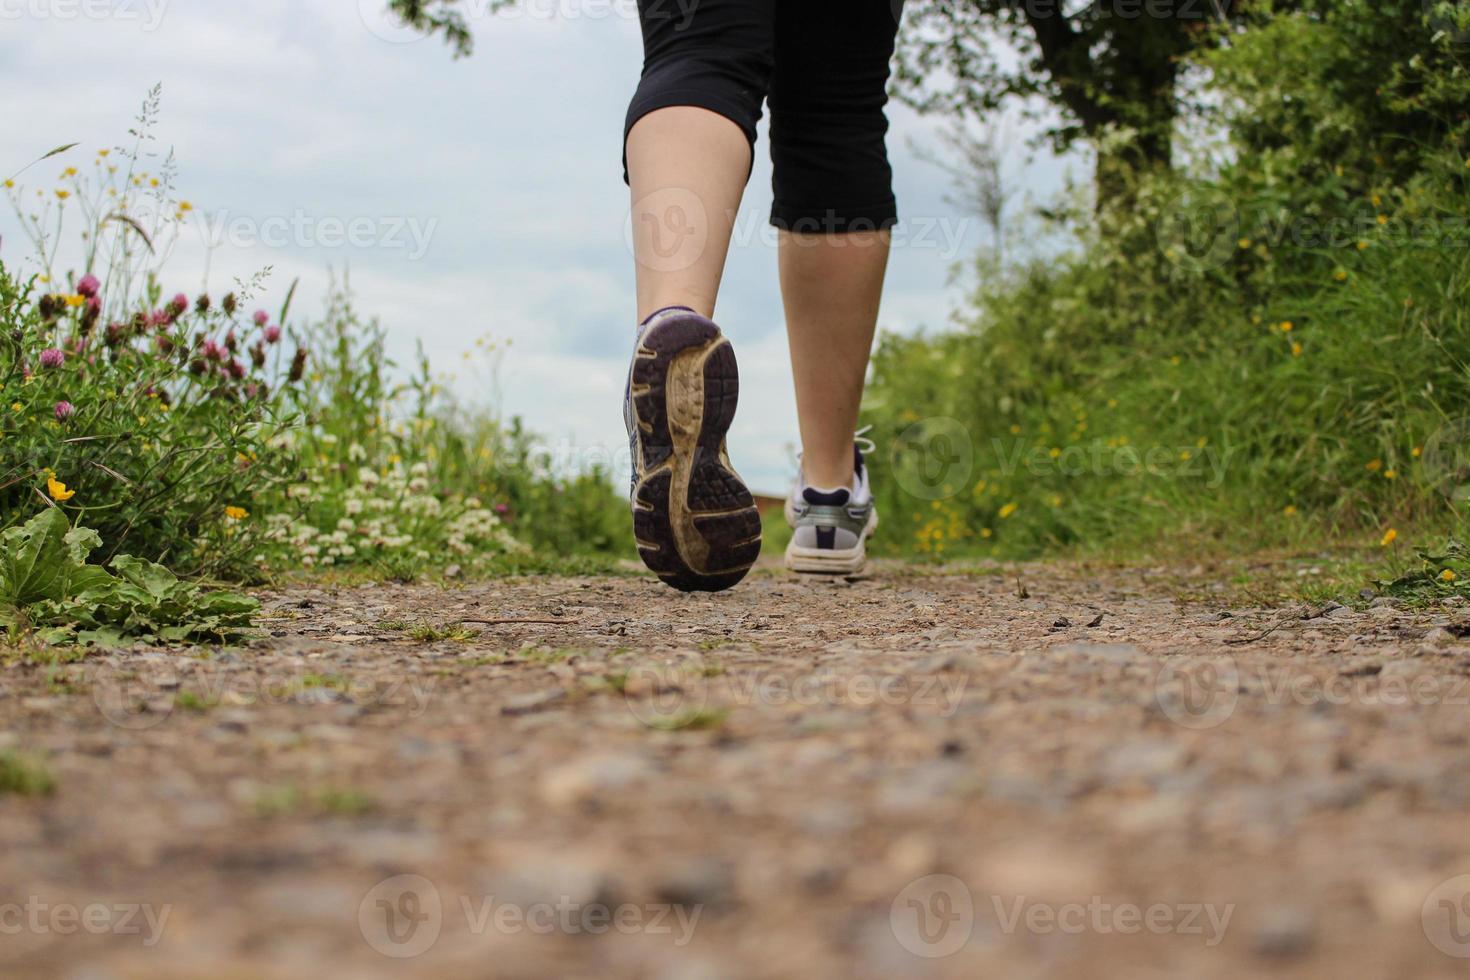 löpare på vandringsled foto